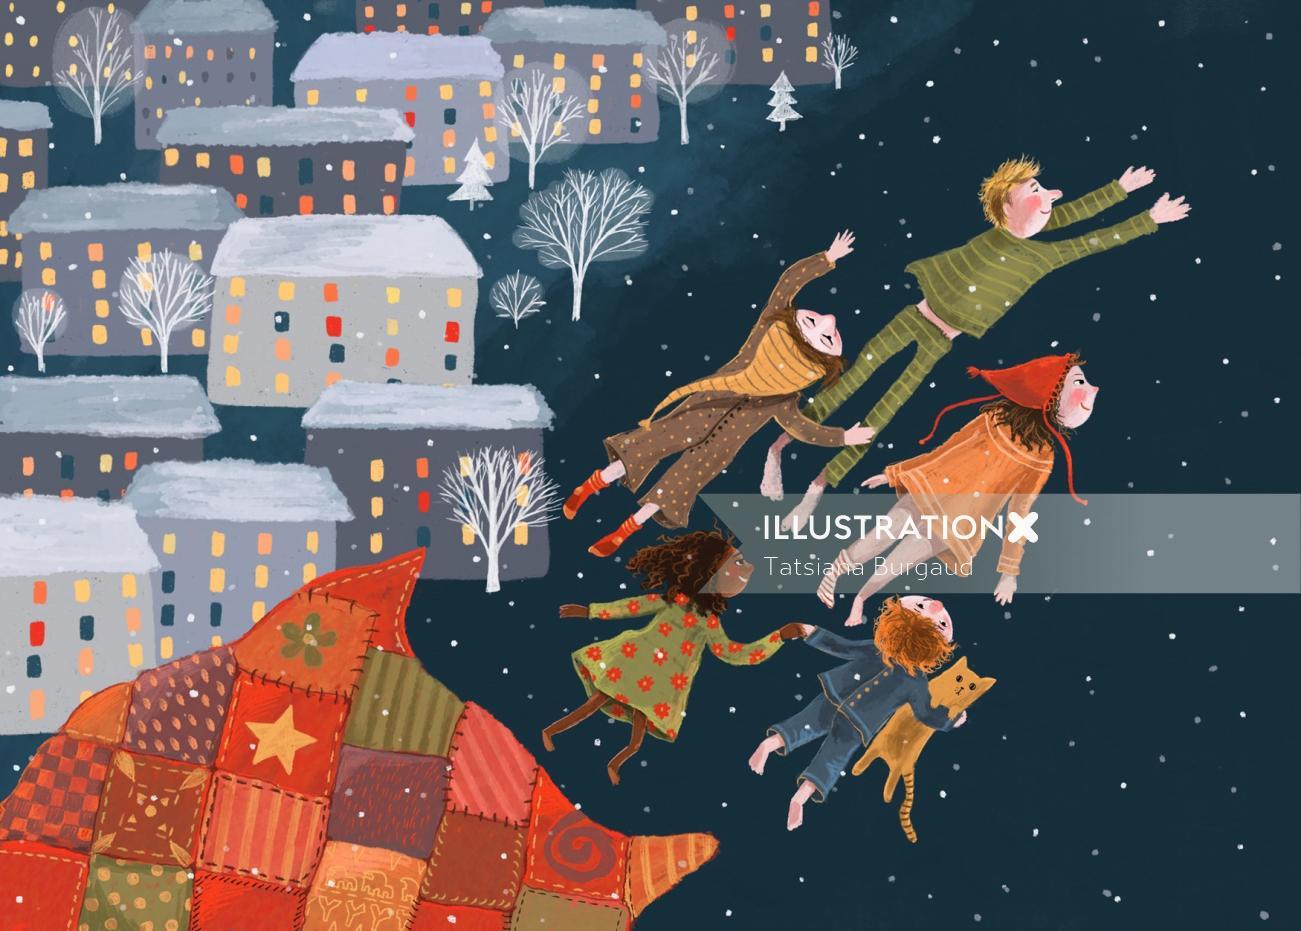 dream, fly, winter, night, christmas, illustration, family